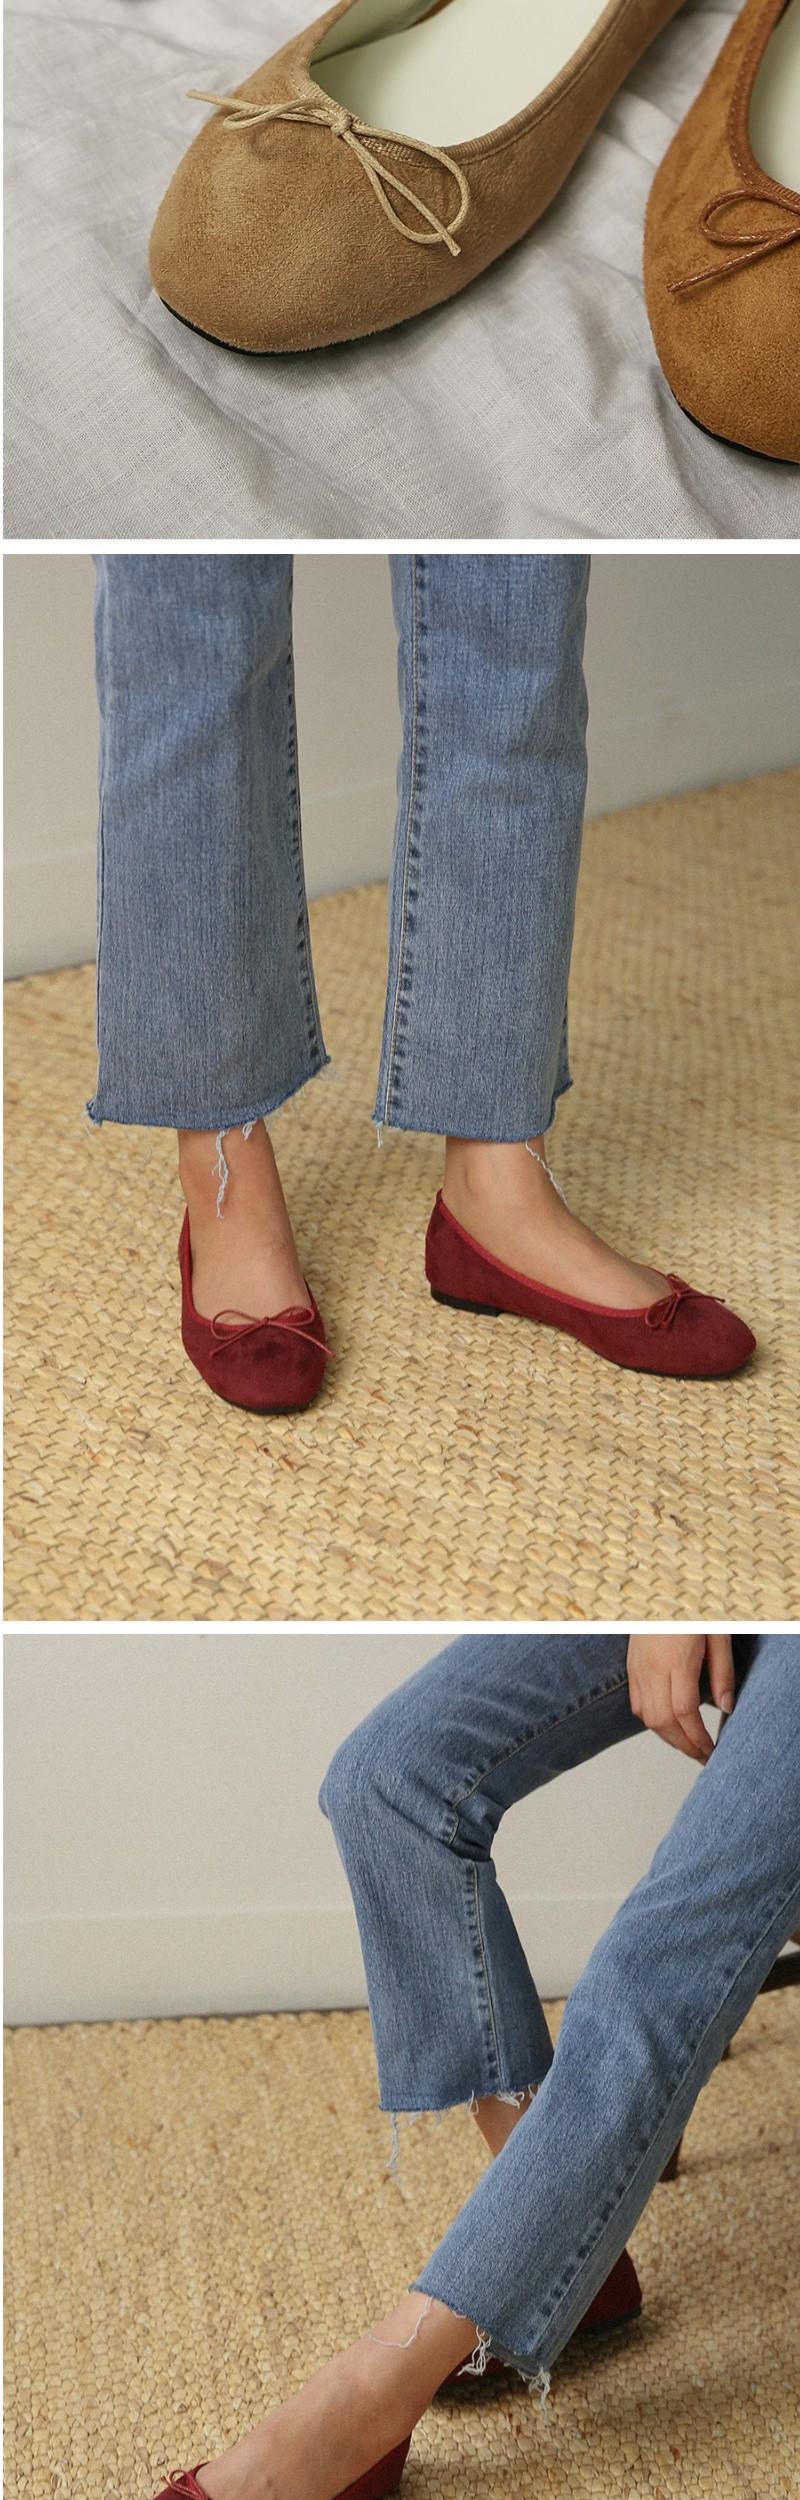 11colors ribbon flat shoes